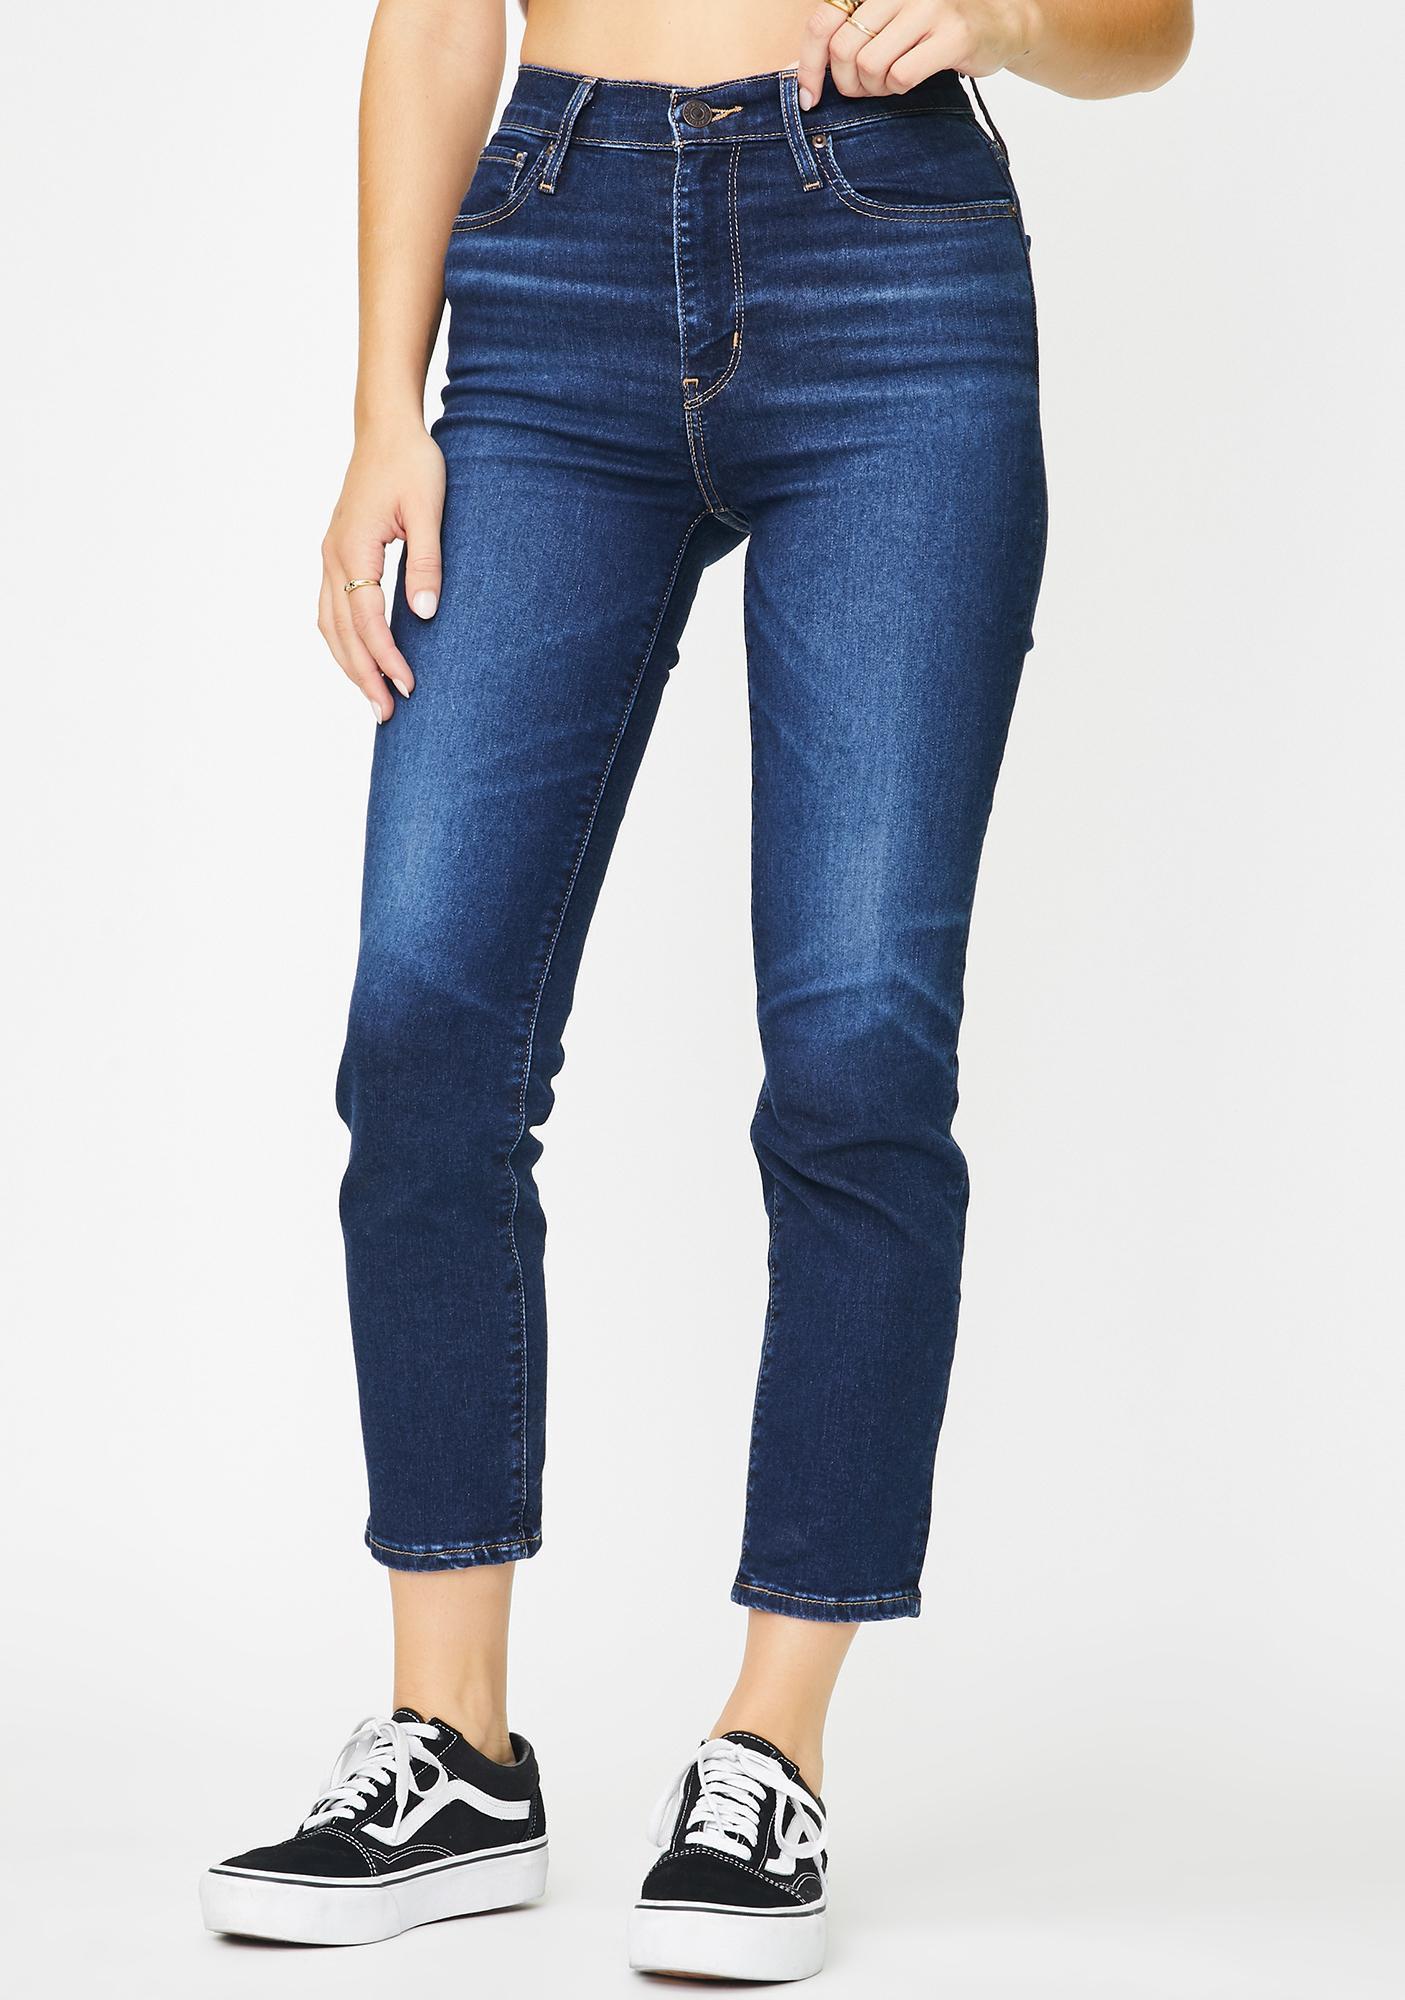 Levis London Indigo 724 High Rise Straight Crop Jeans